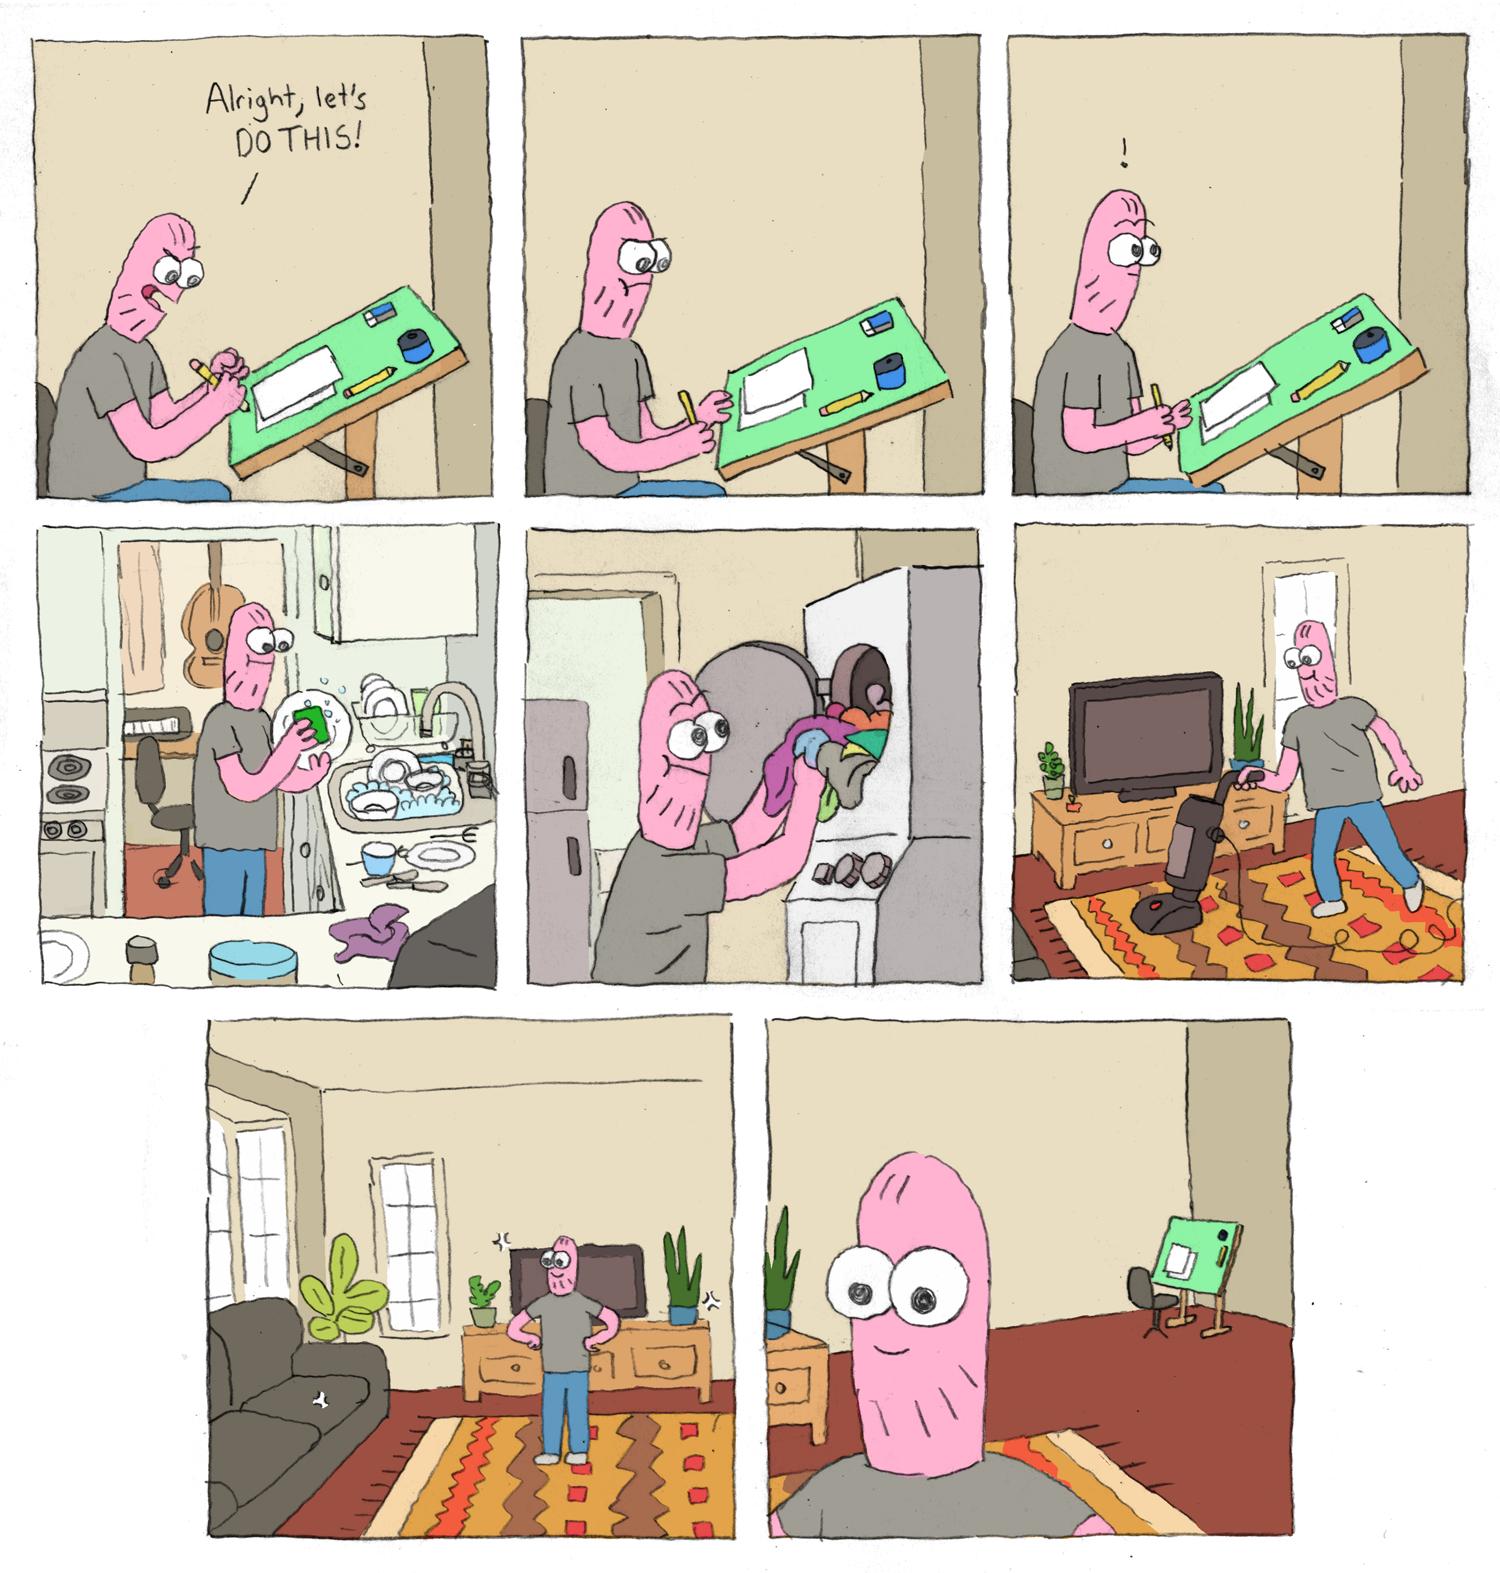 Procrastination_format_001.png